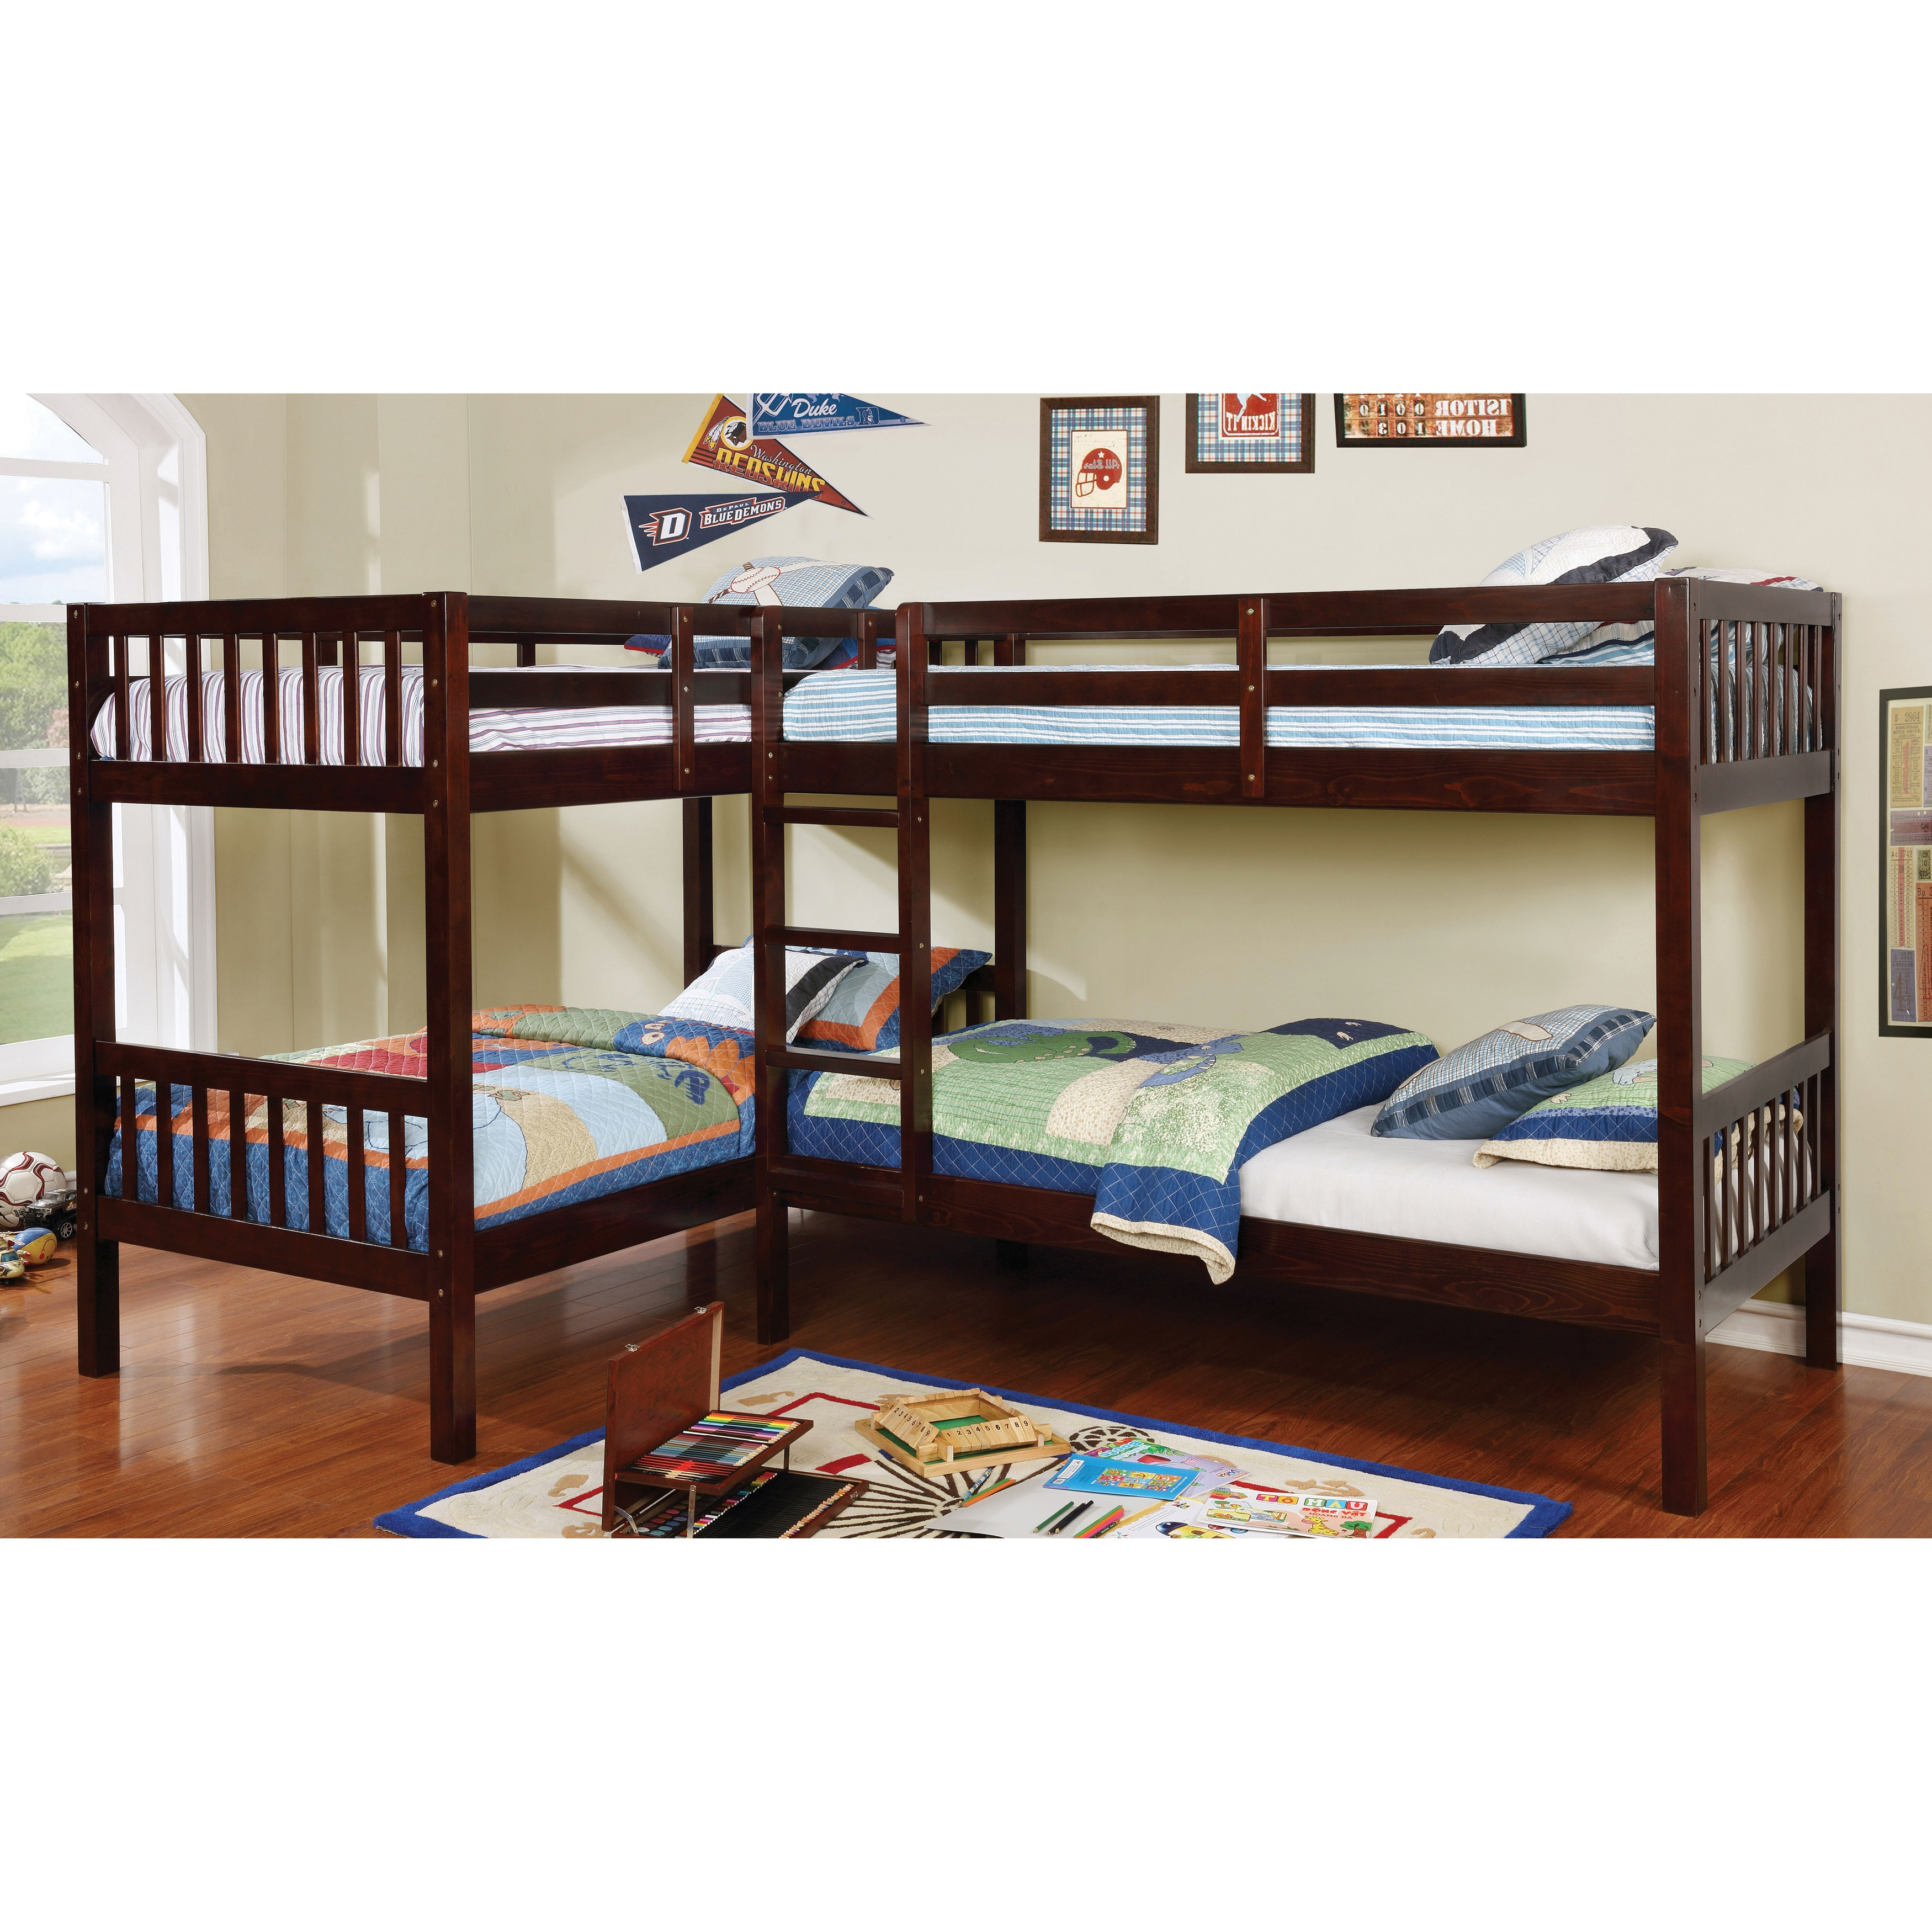 Shop Lankton Contemporary Twin L Shaped Quadruple Bunk Bed By Foa